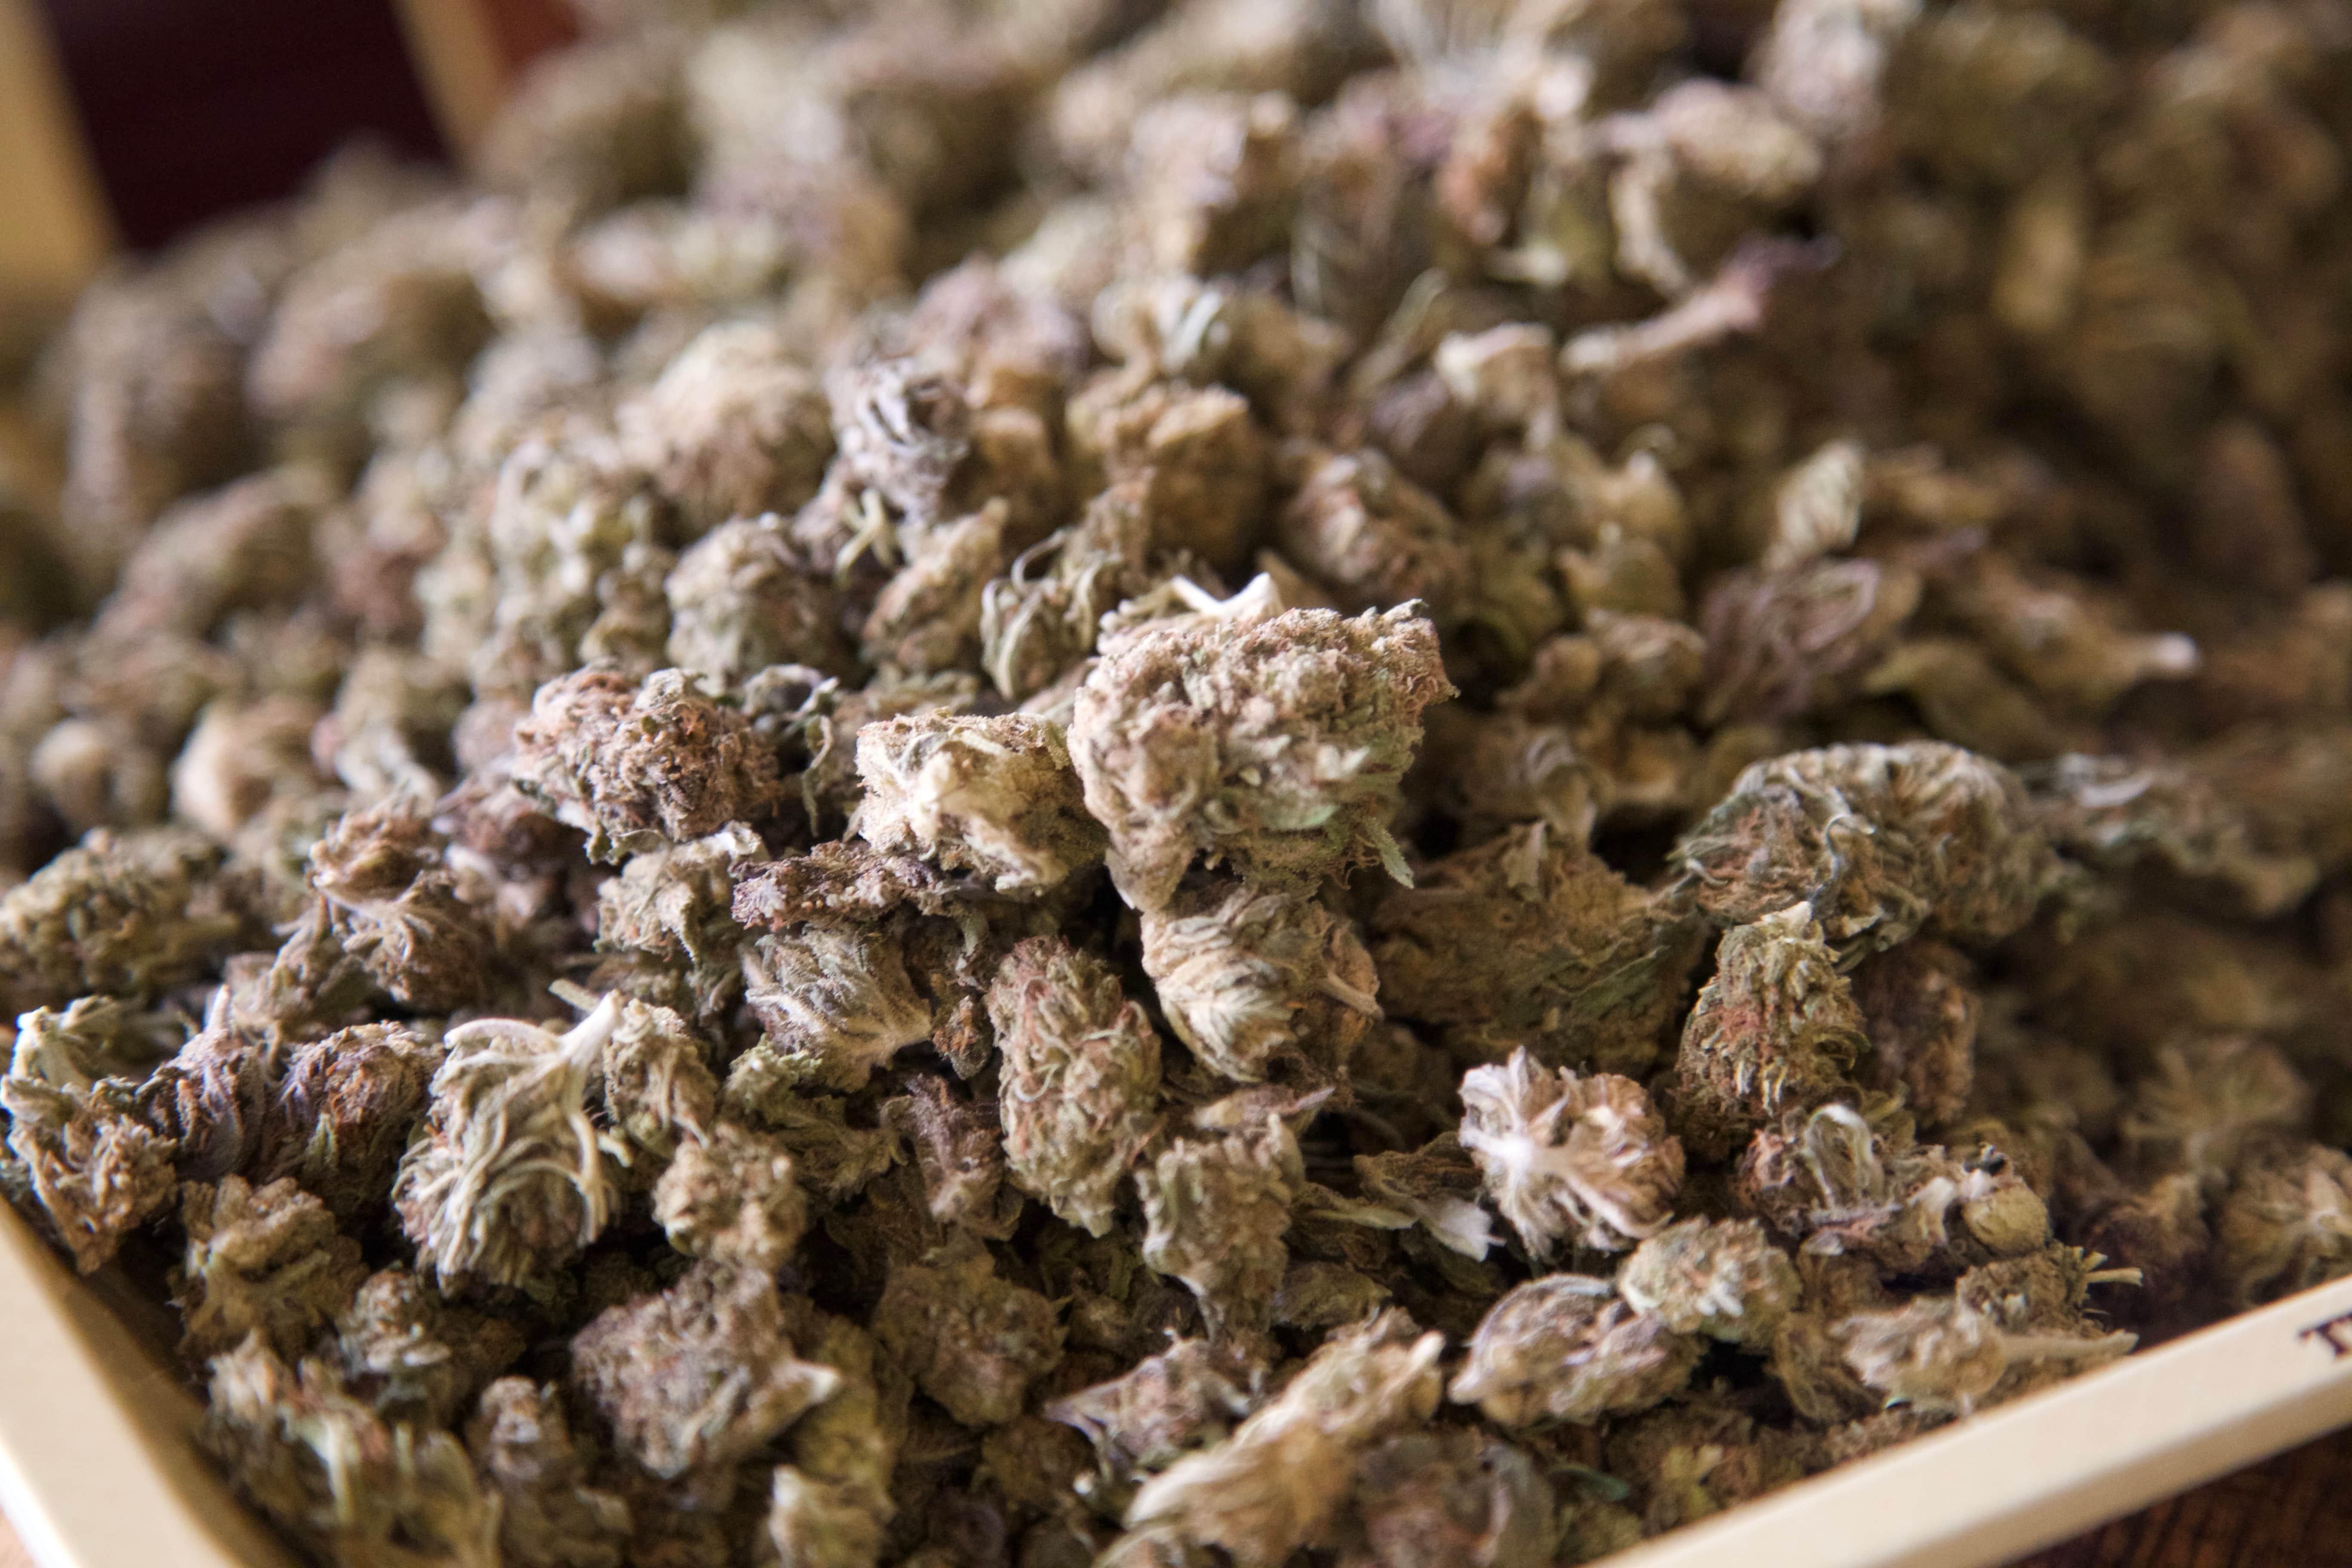 A Better Smoke: Are CBD Pre-Rolls the New Alternative to